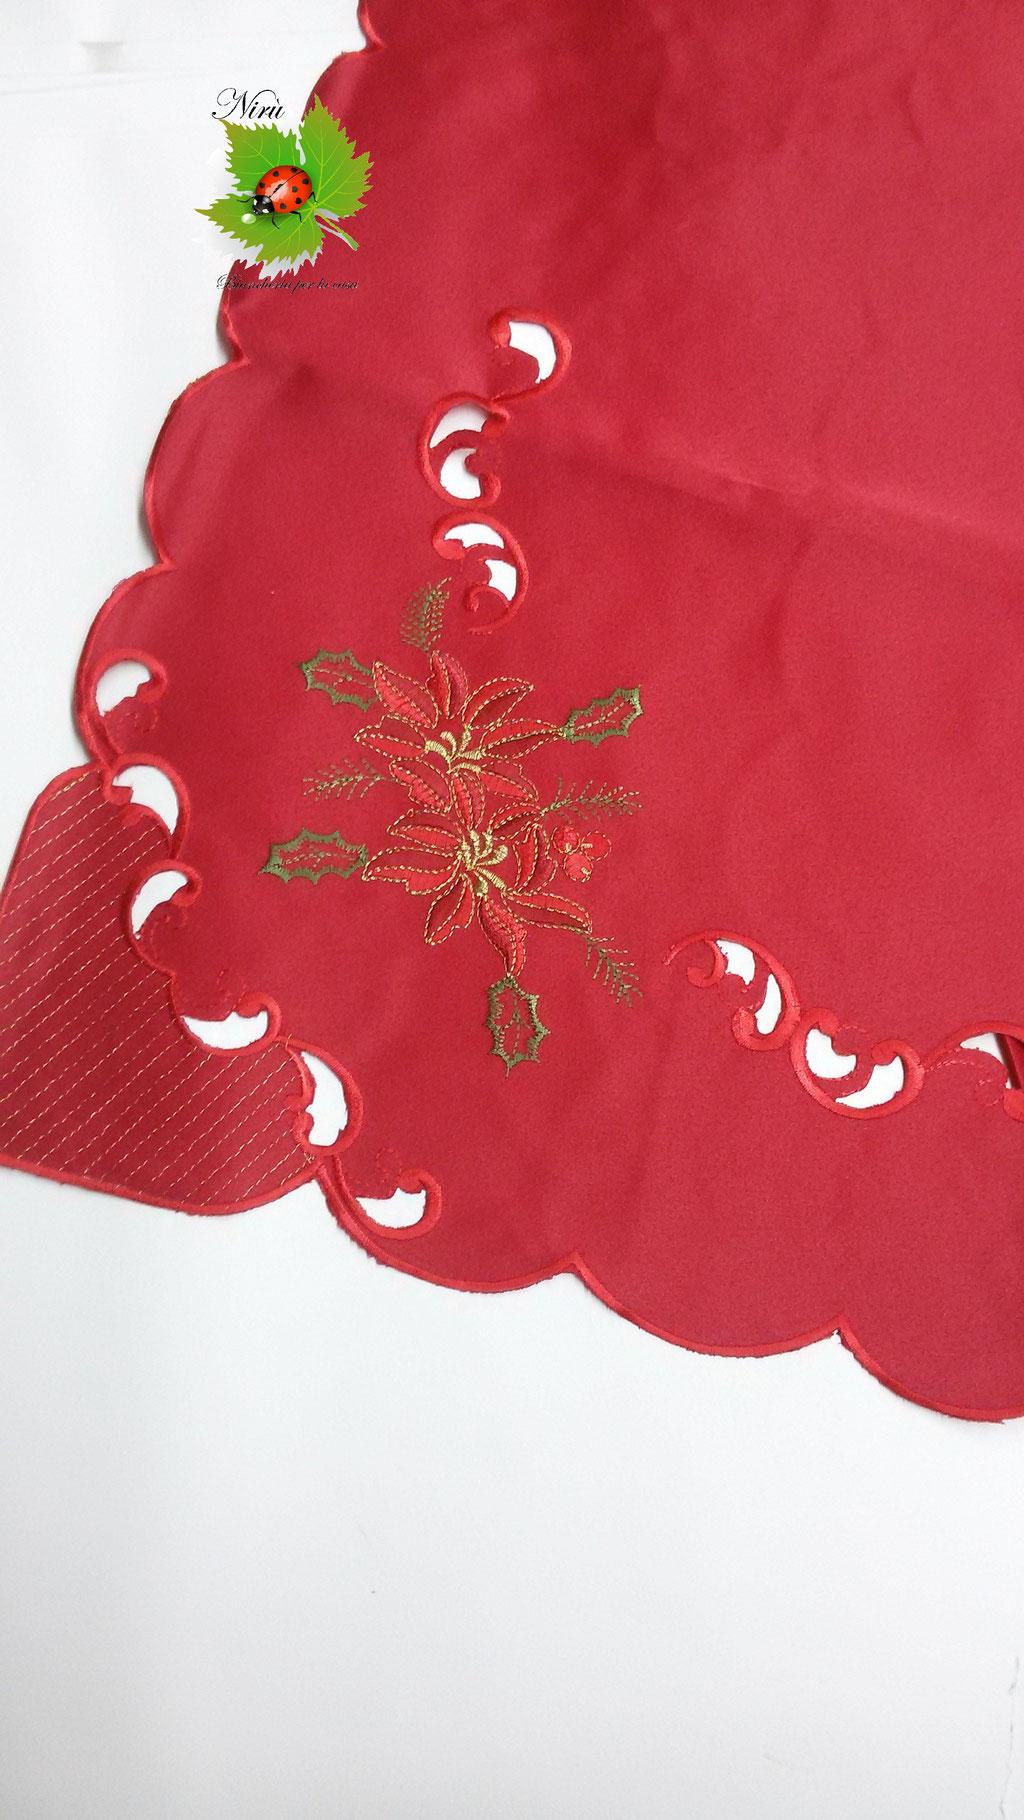 Copritavola tovaglia natalizia da 6 posti 140x180 cm. B84